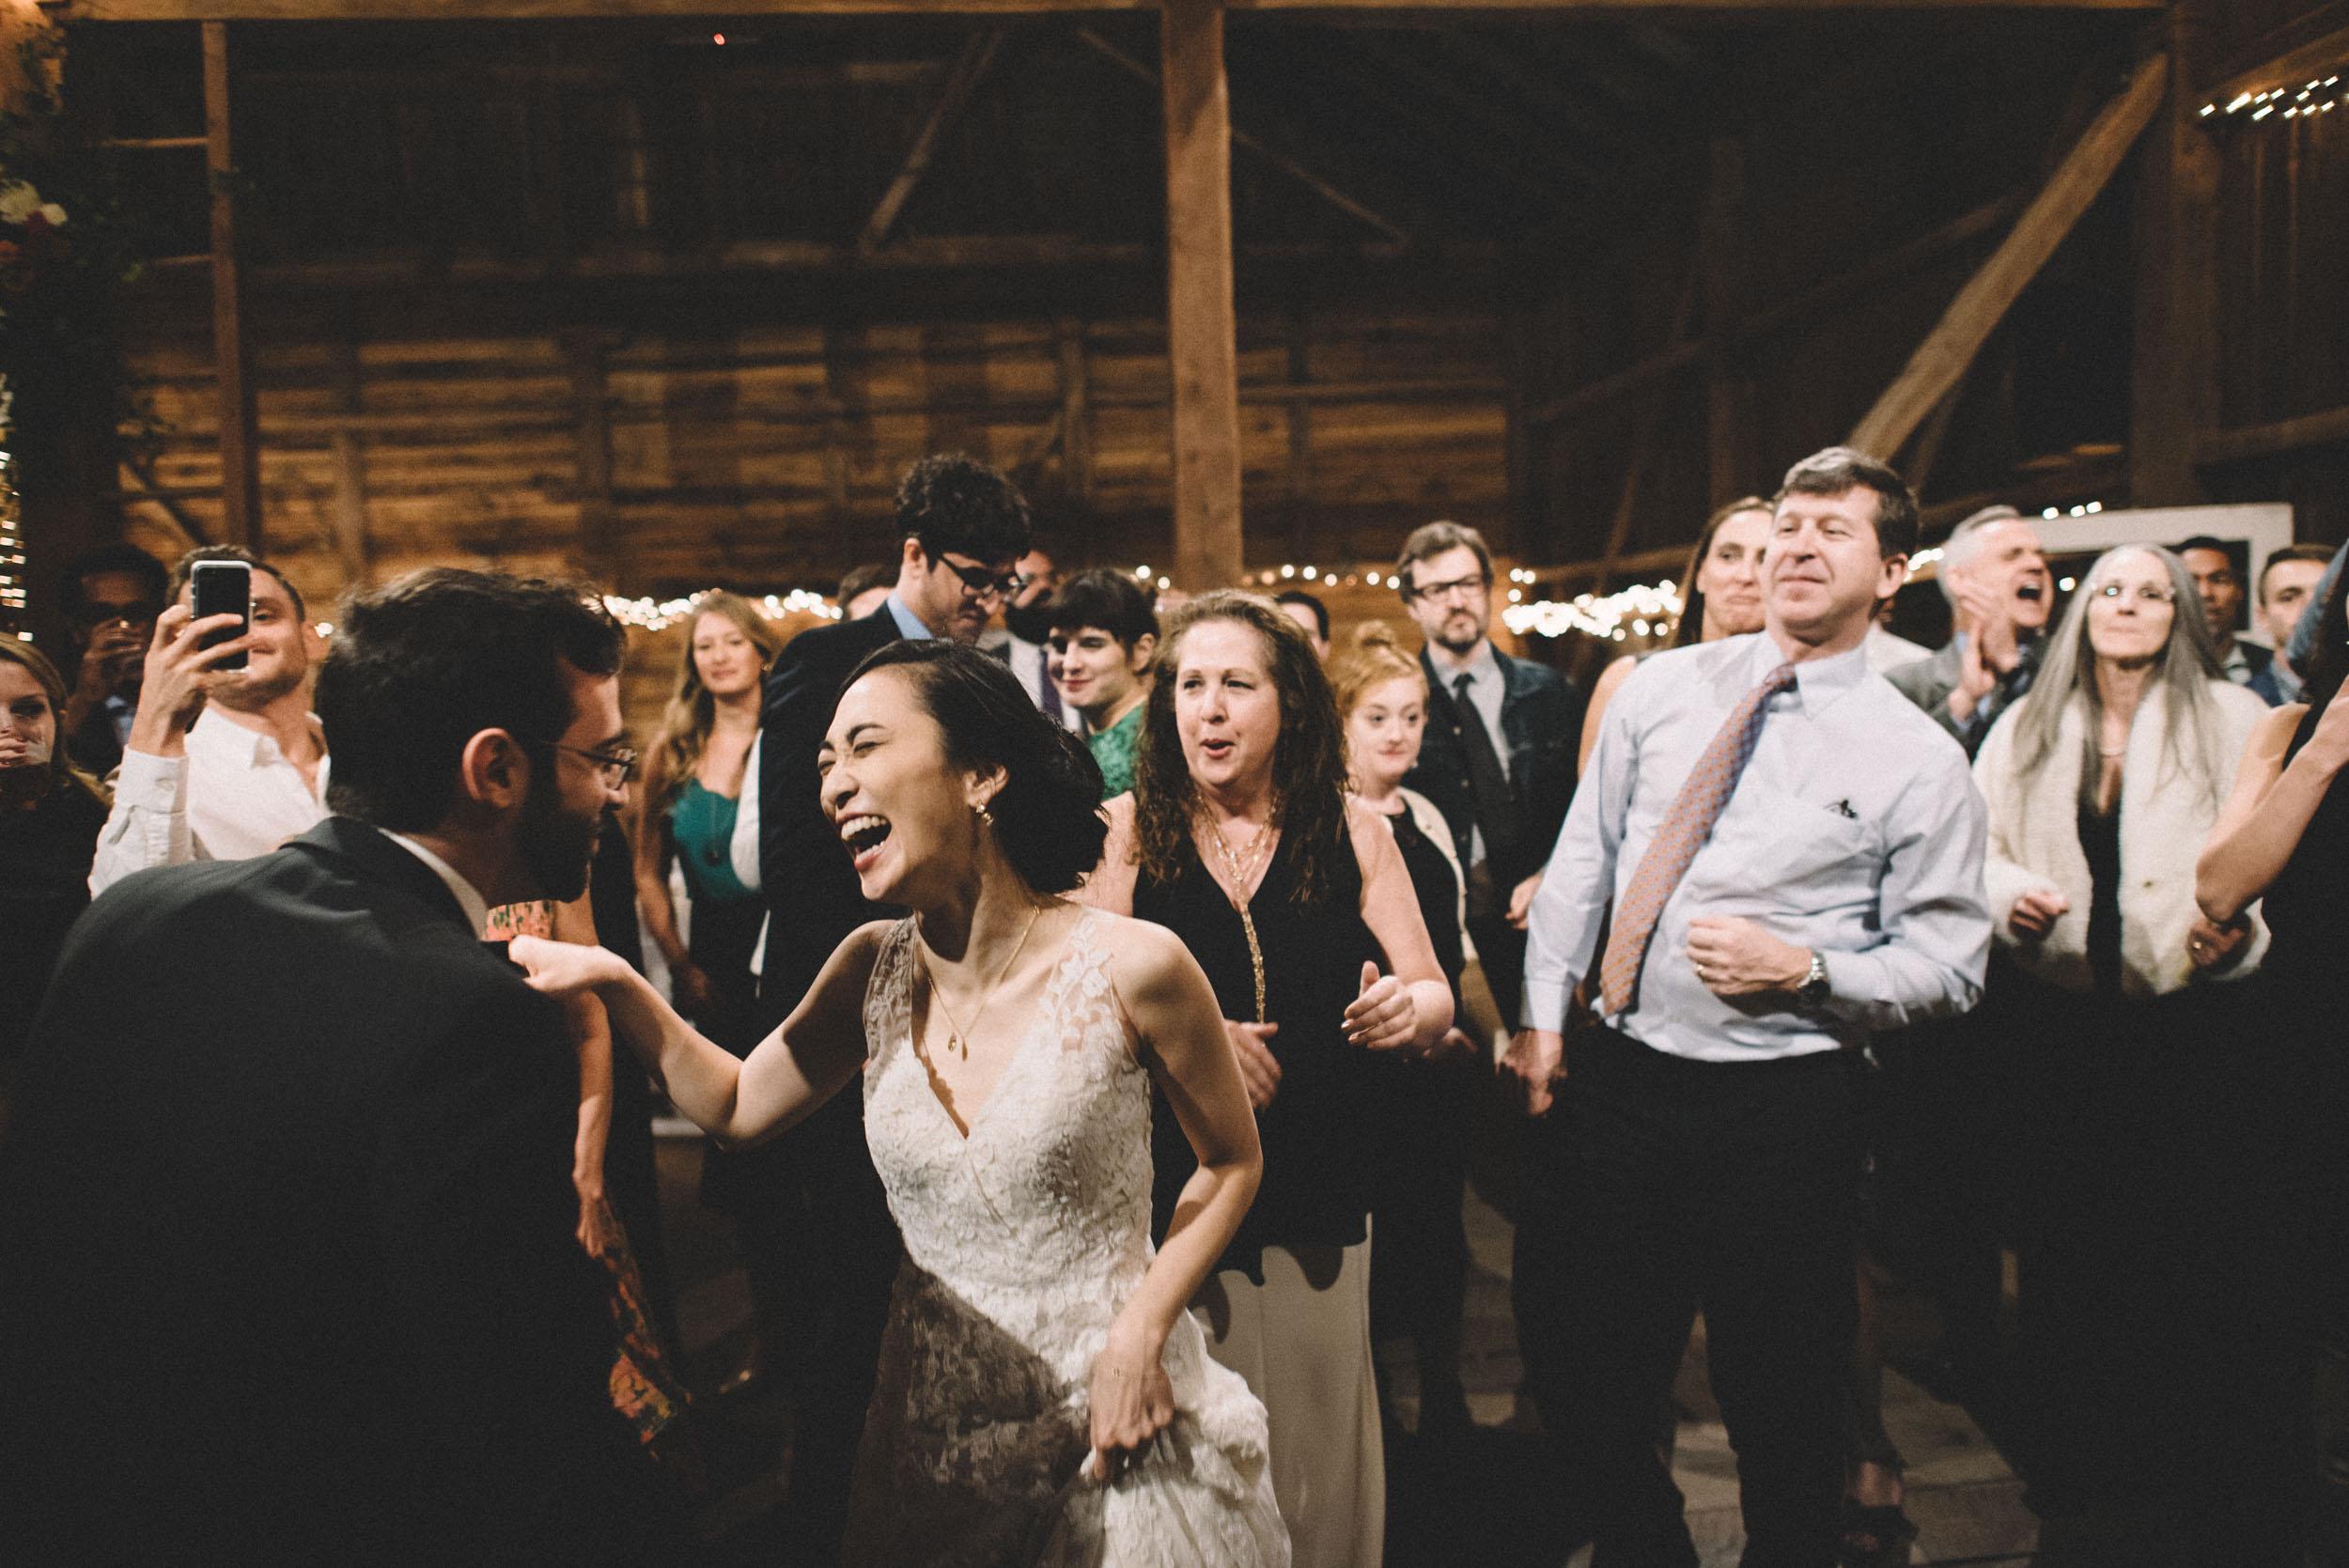 poolseville-maryland-wedding-photographer-72.jpg